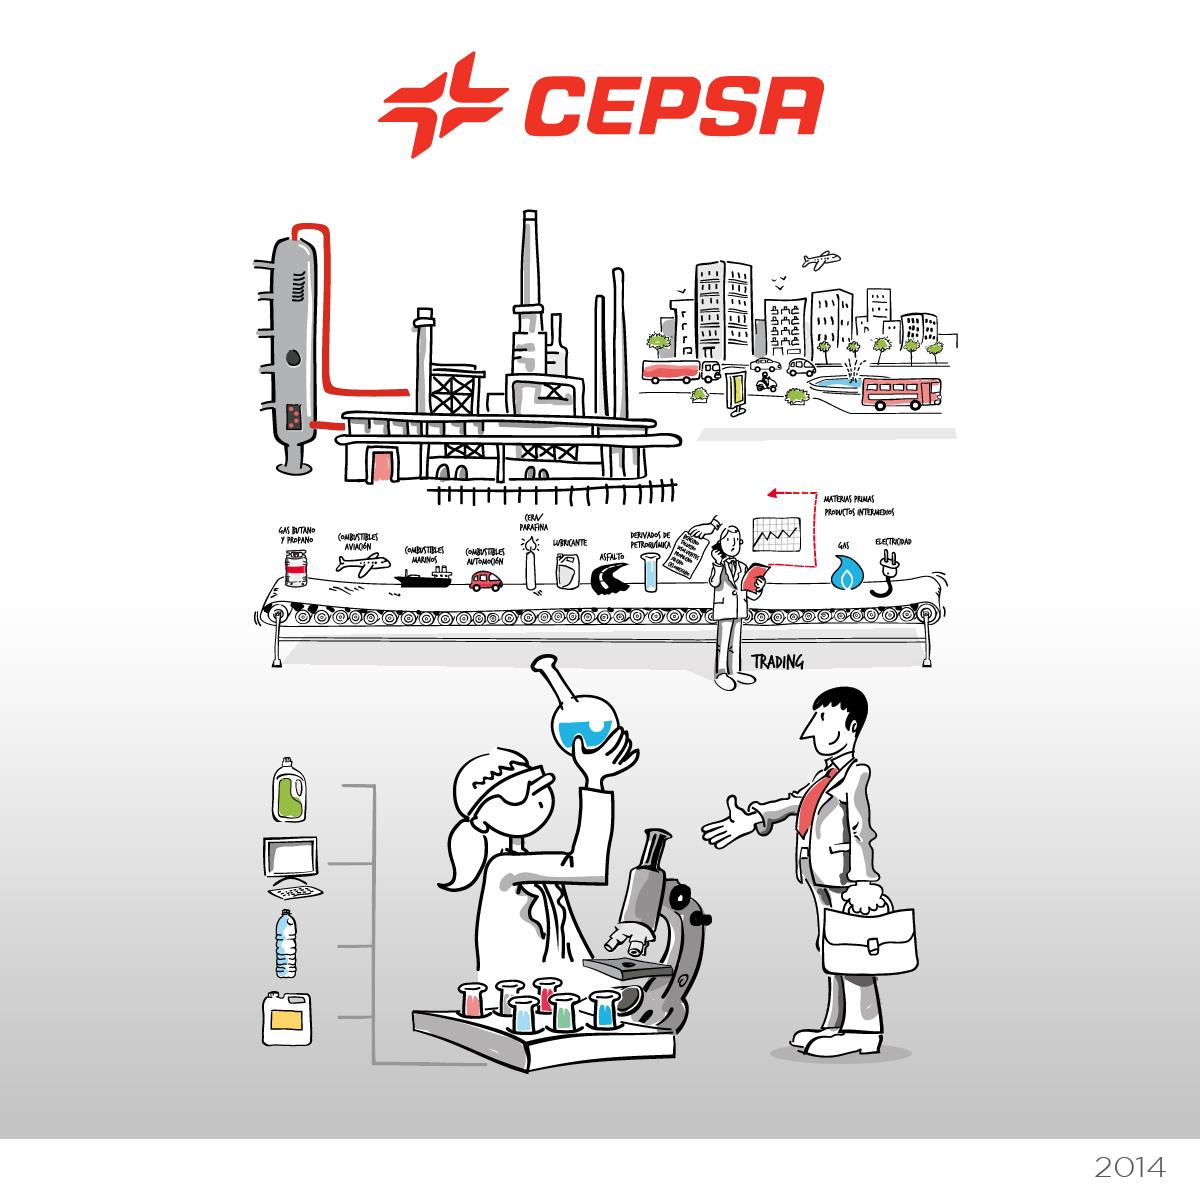 Ilustraciones empresa petroquímica